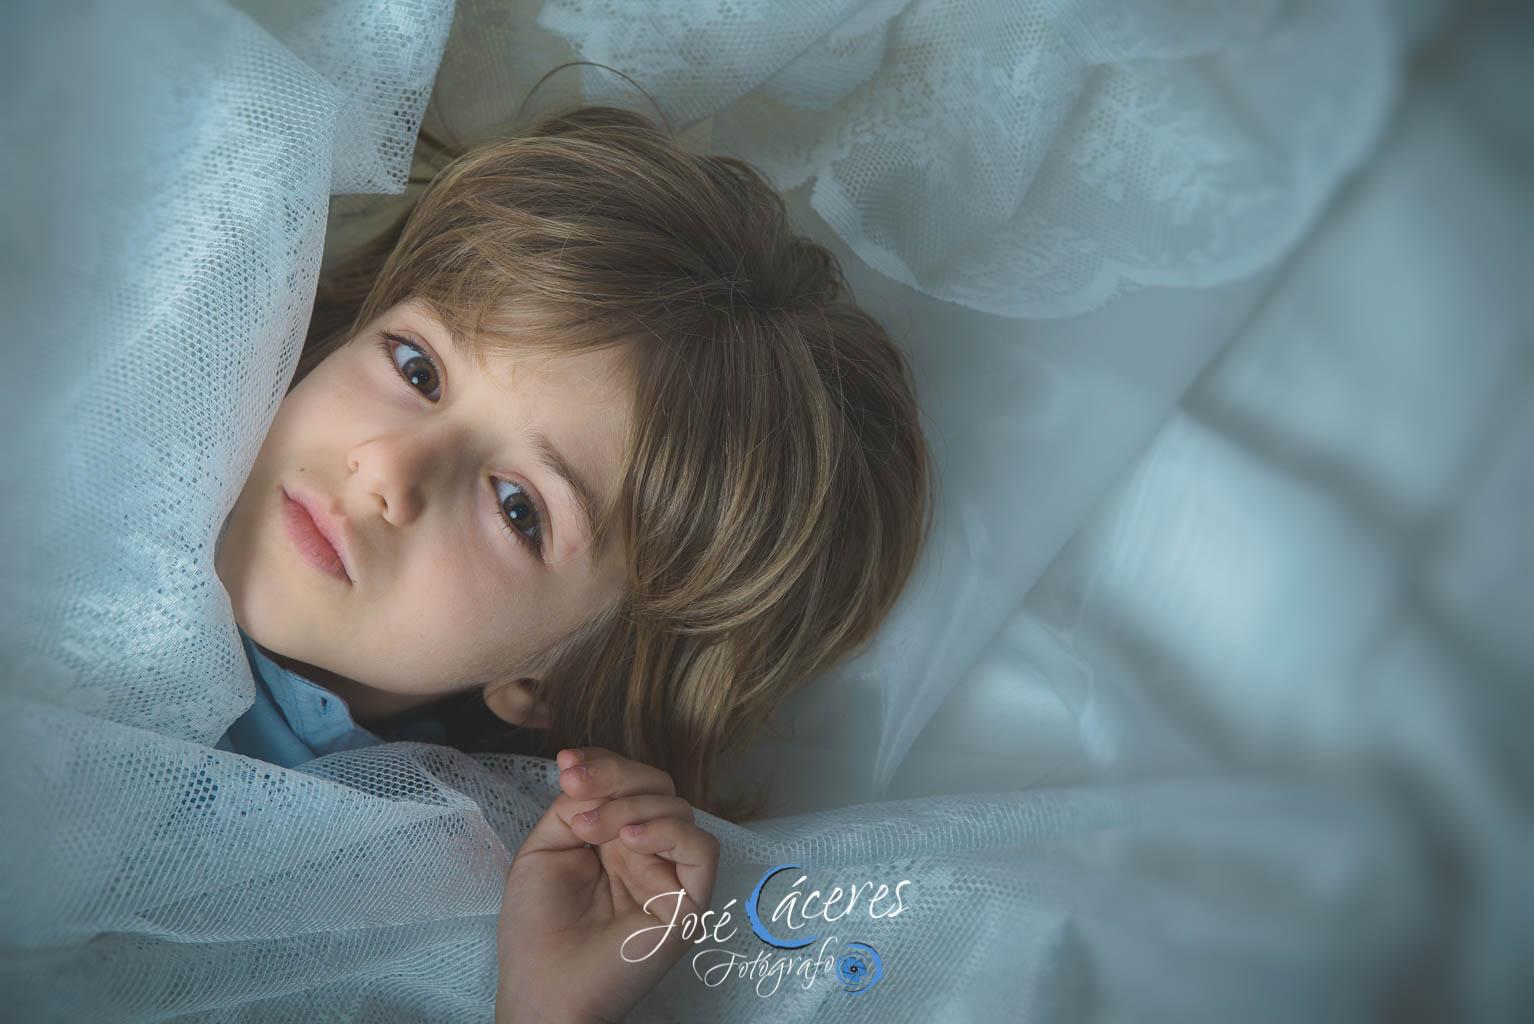 Jose Caceres Fotografia, Sesion Estudio Fotografia Niños-4